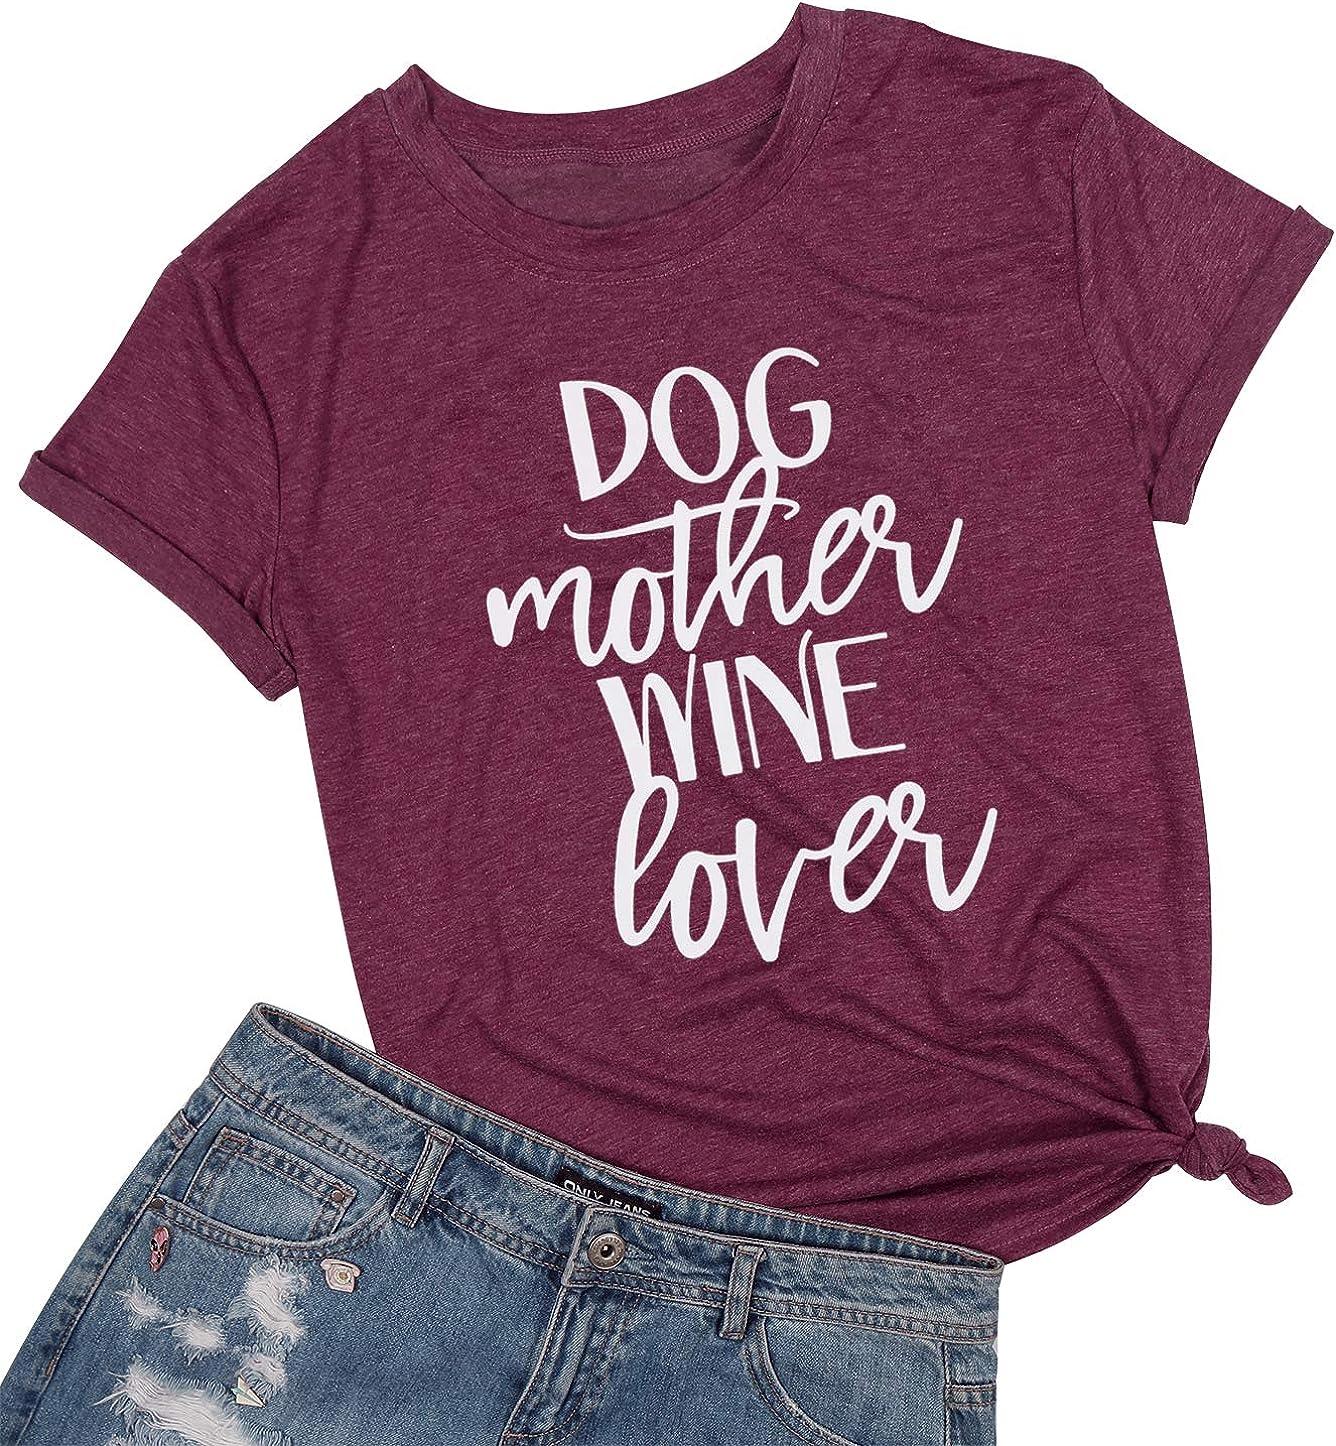 wine lover ladies fit black t-shirt. Dog mother